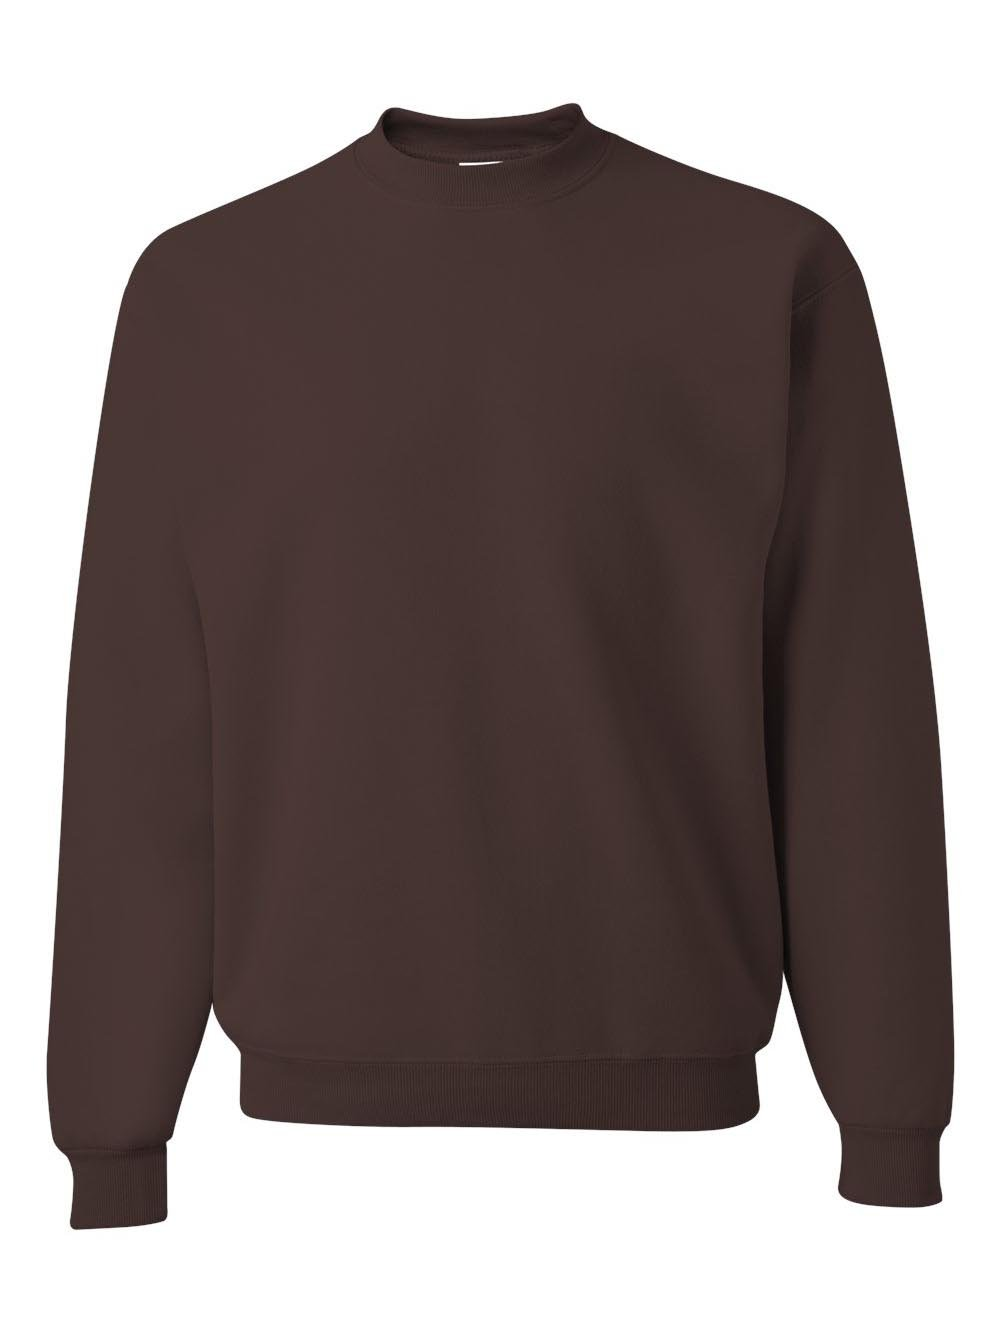 Jerzees Adult Mid-Weight Crewneck Sweatshirt, Chocolate, Medium